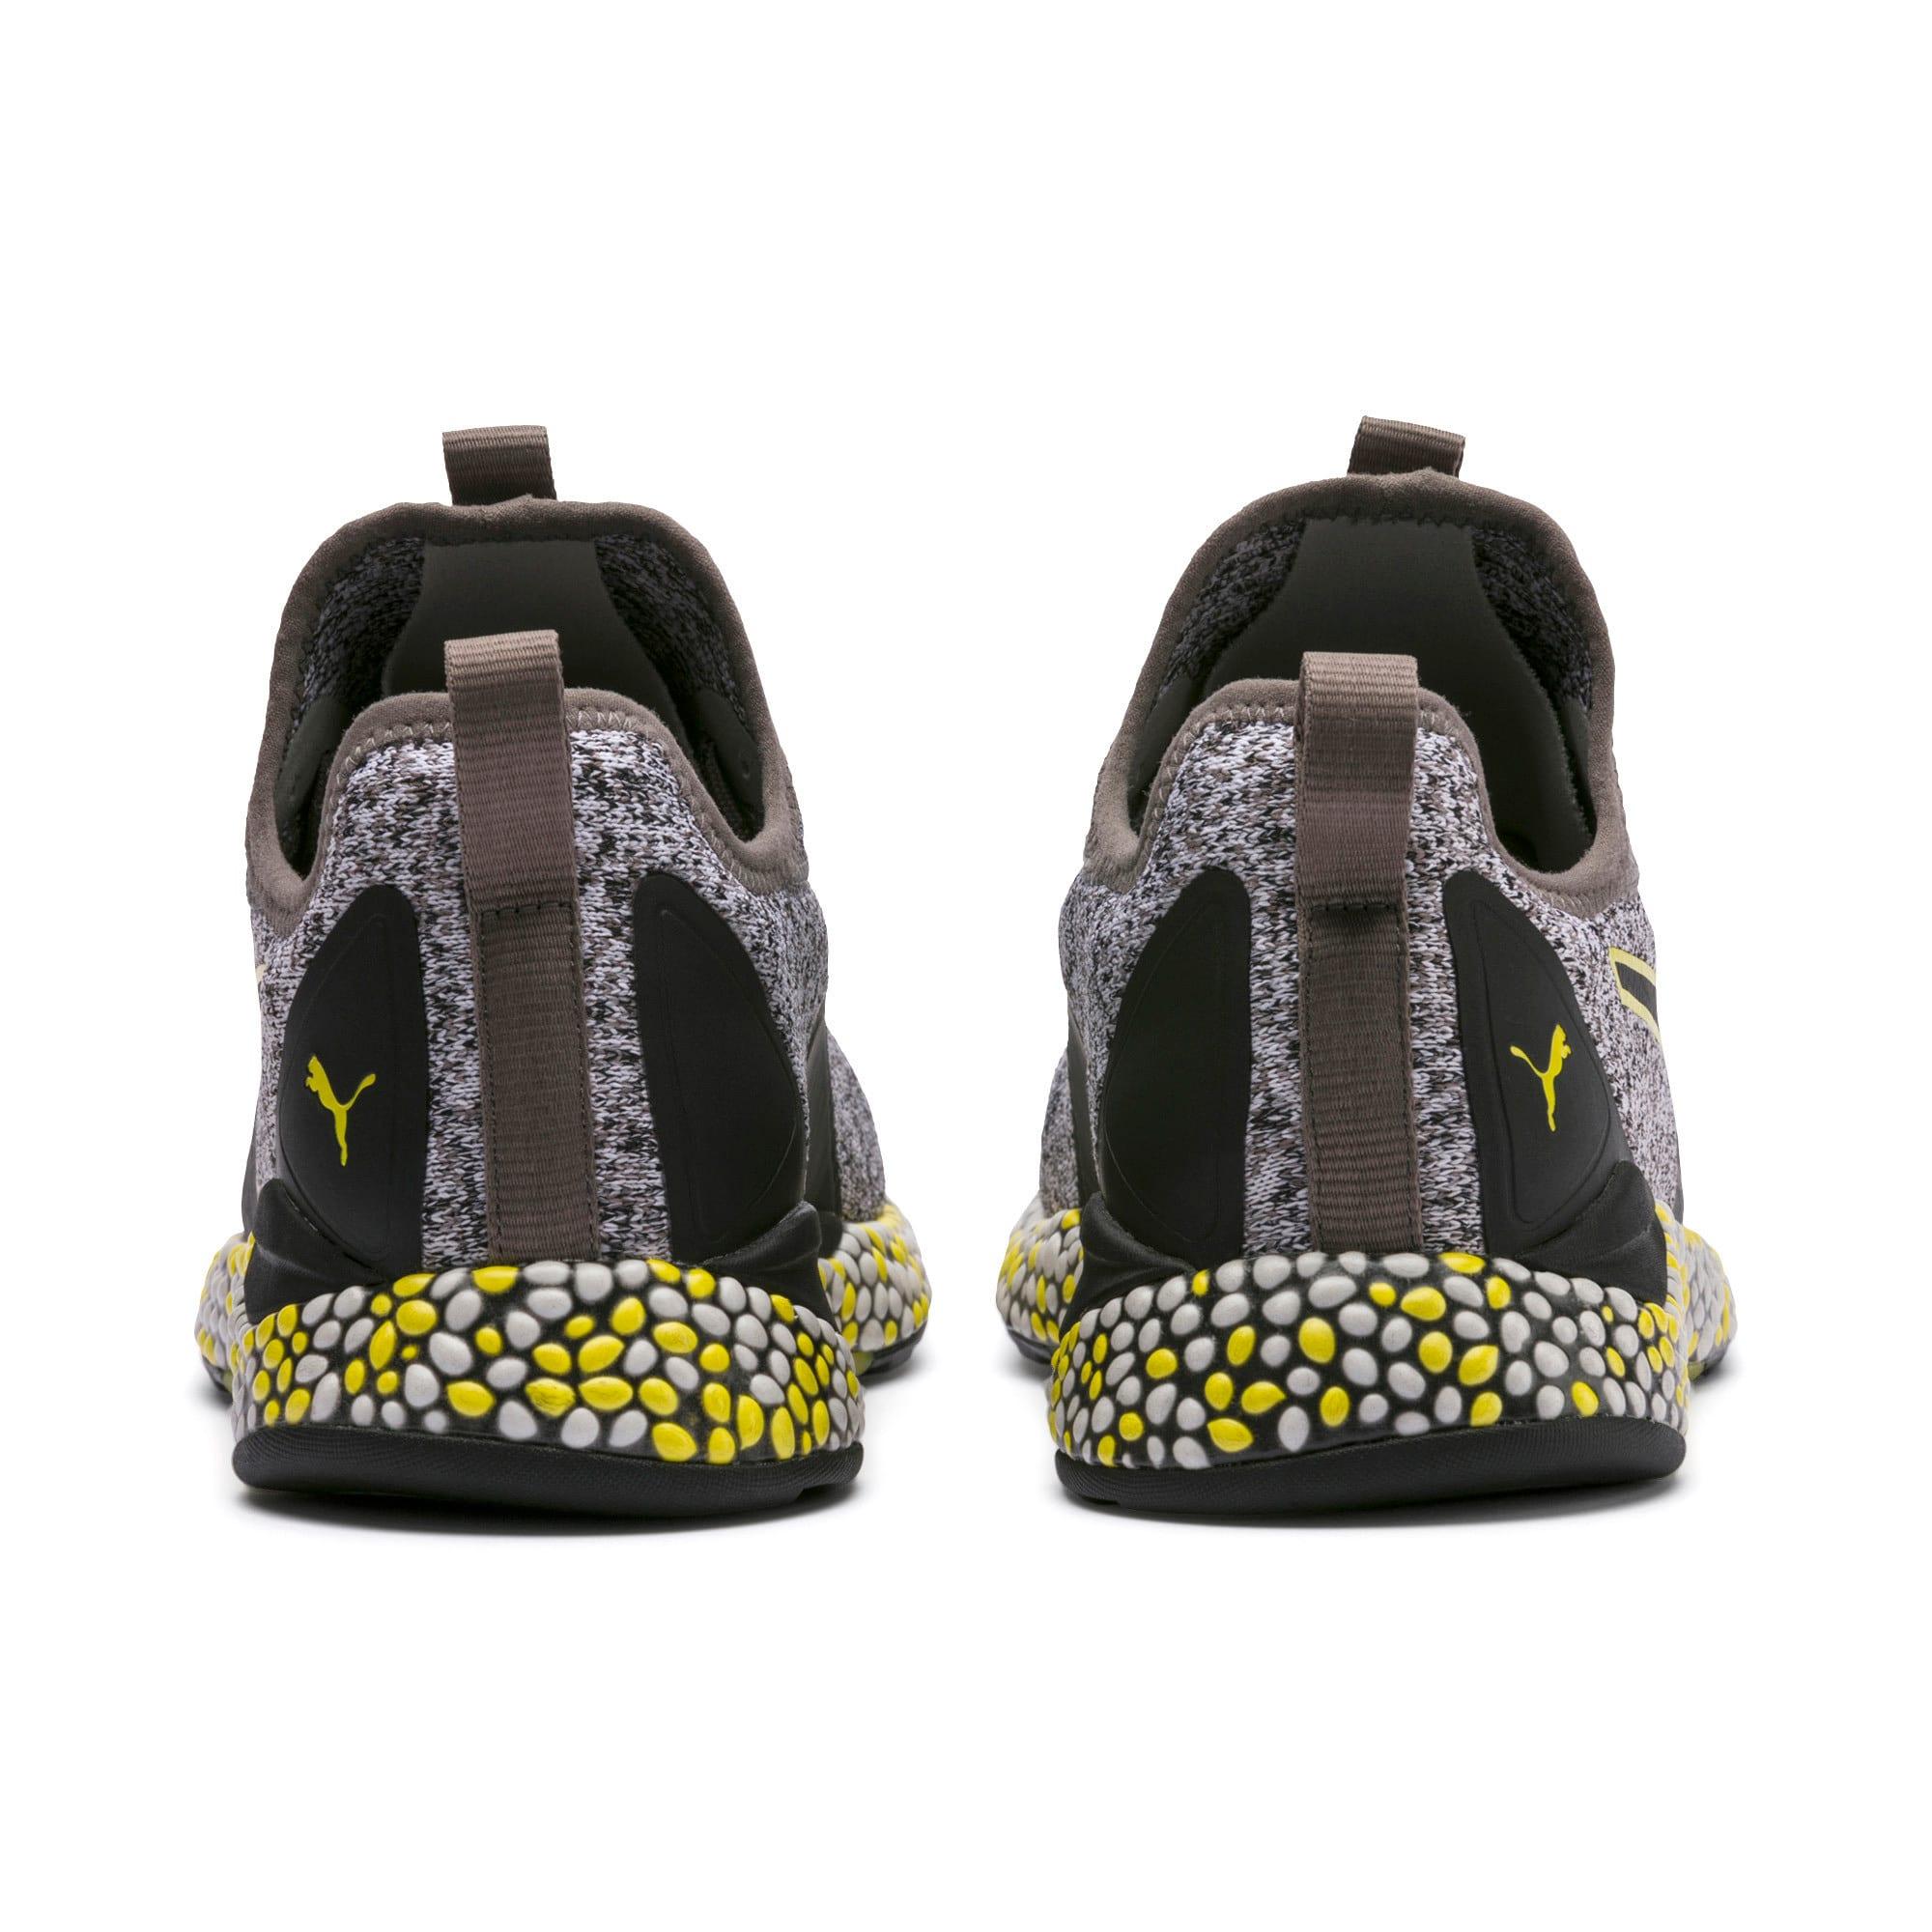 Thumbnail 3 of Hybrid Runner Men's Running Shoes, Black-White-Blazing Yellow, medium